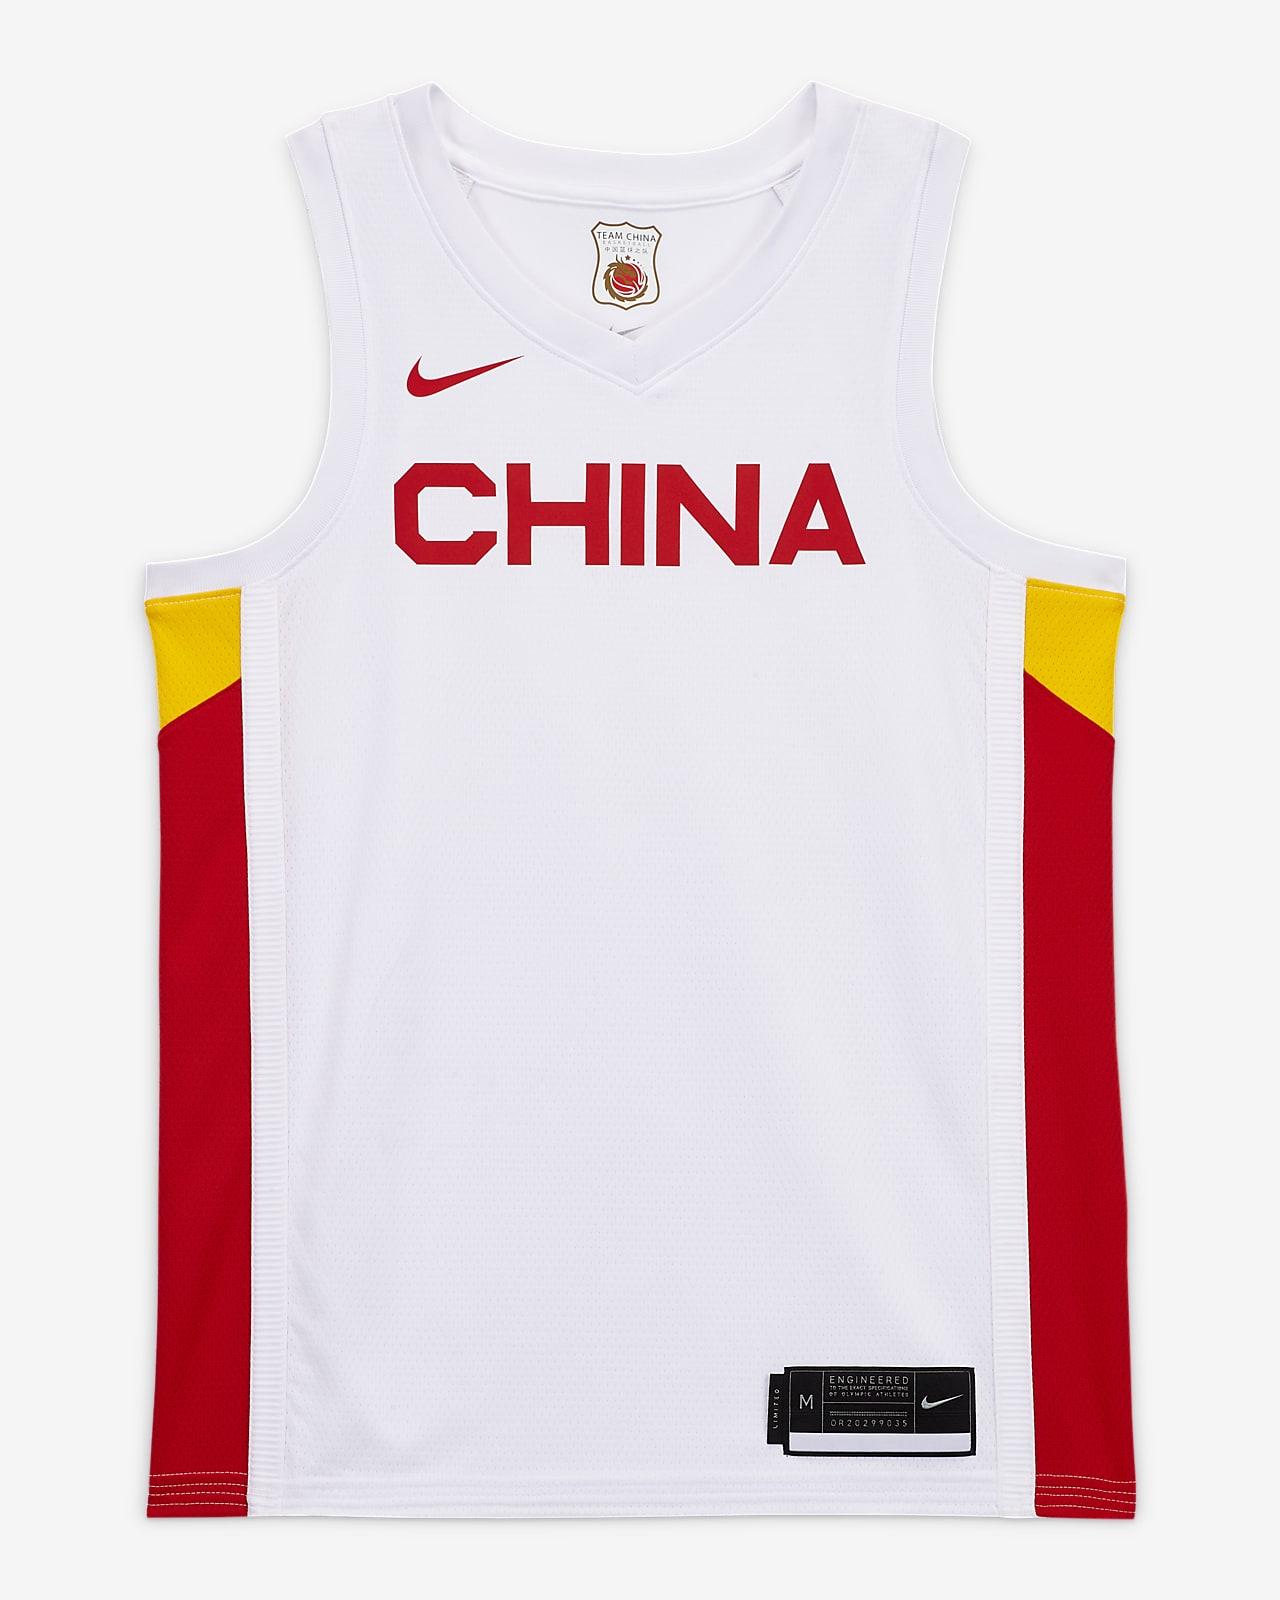 China (Home) Men's Nike Basketball Jersey